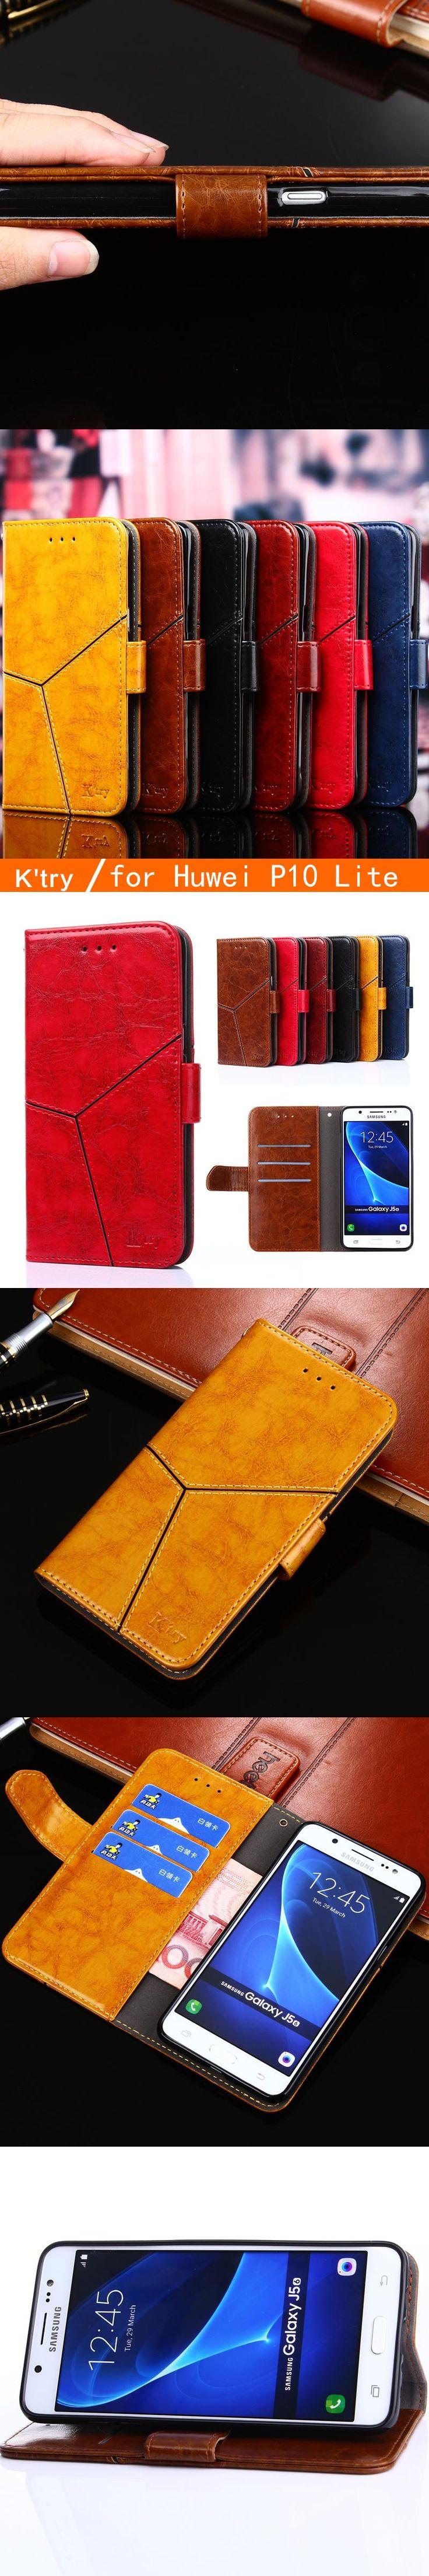 "Huawei P10 Lite Case 2017 Luxury Flip Leather Case For Huawei P10 Lite Wallet Book Cover Hawei P10 Lite P10Lite 5.2"" Phone Cases"